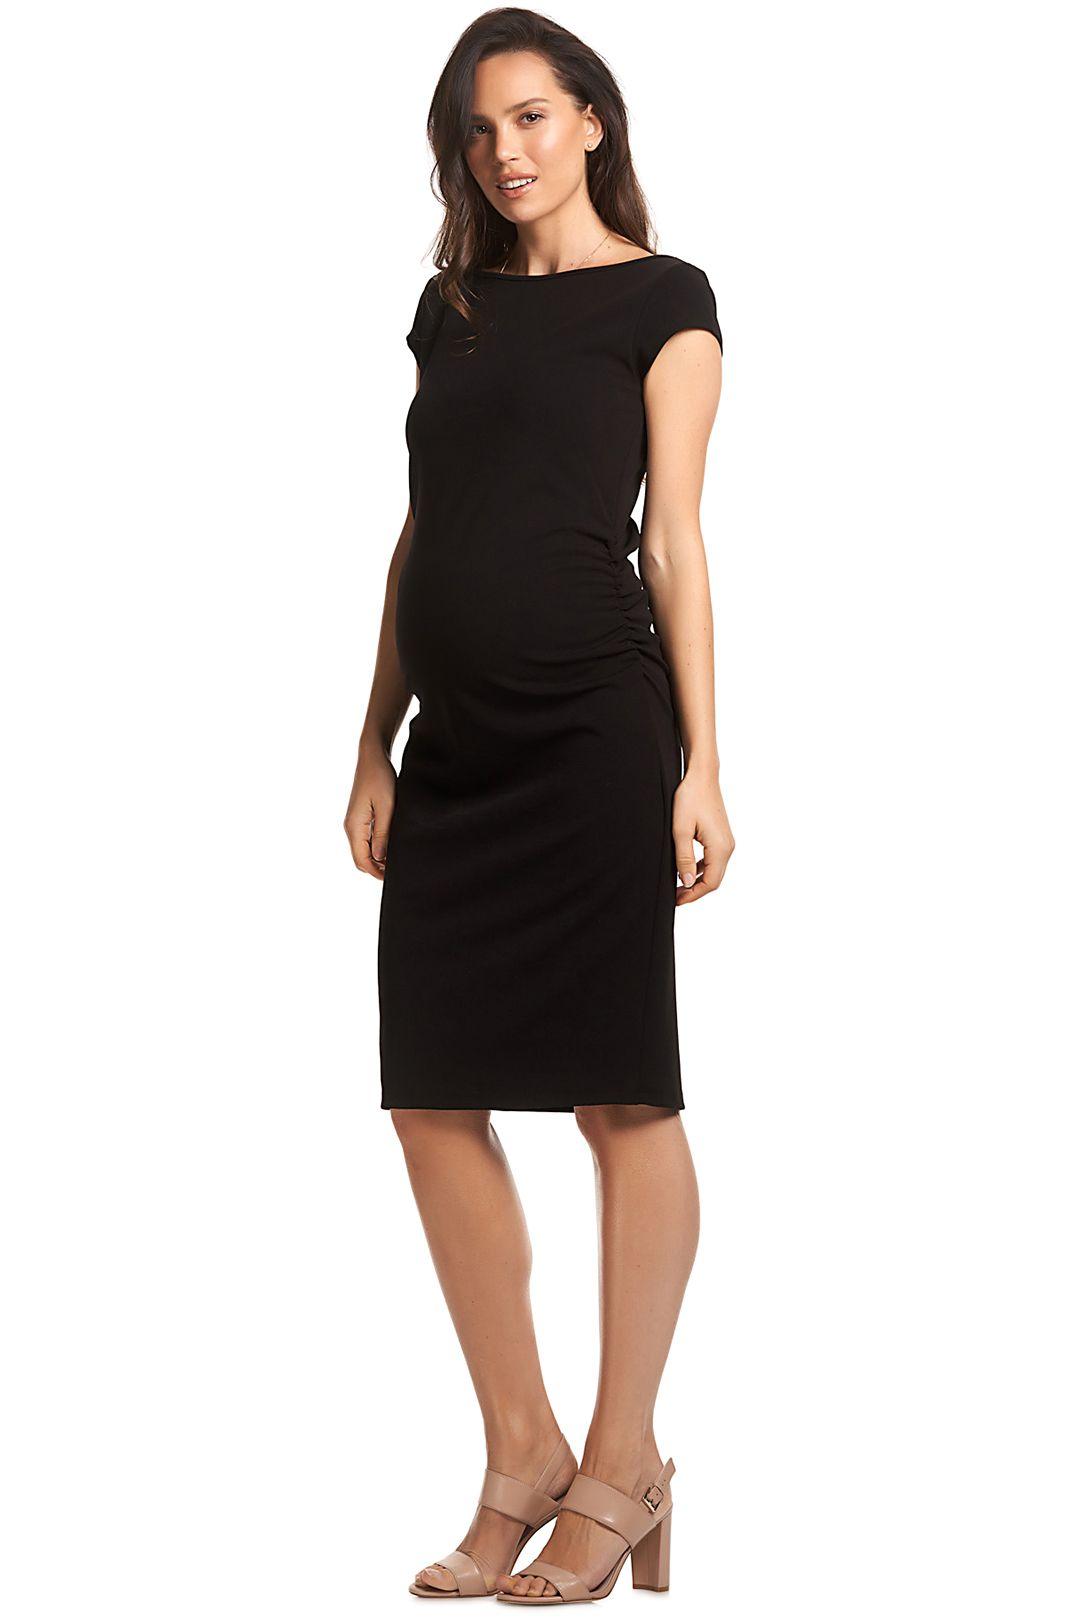 Soon-Maternity-Leo-Cap-Sleeve-Dress-Black-Side2